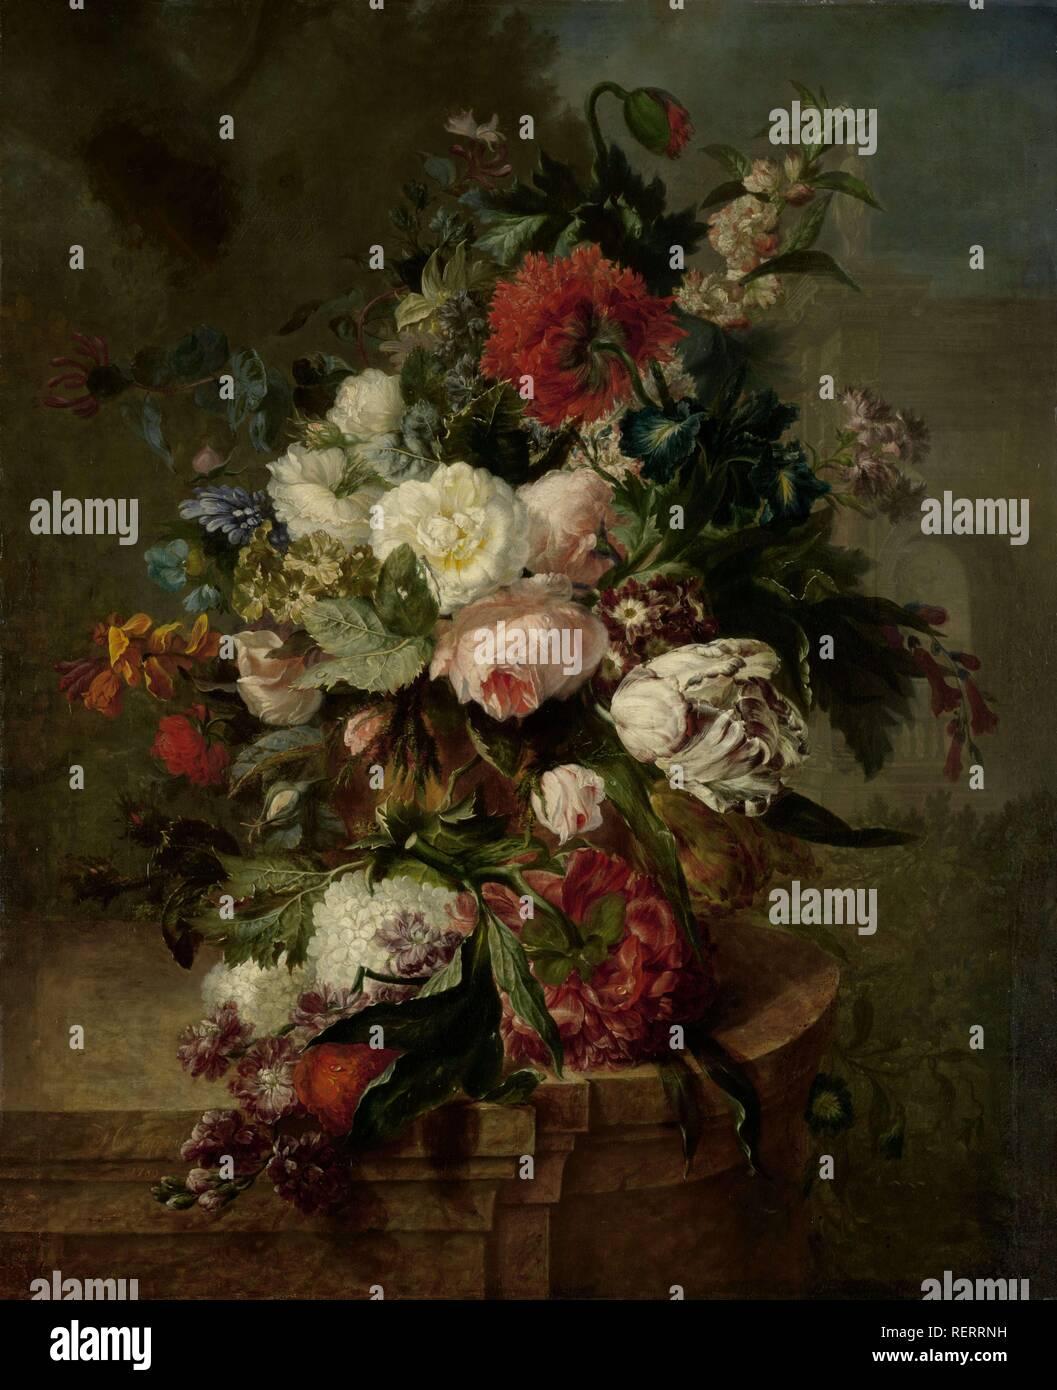 Blumendating-Website